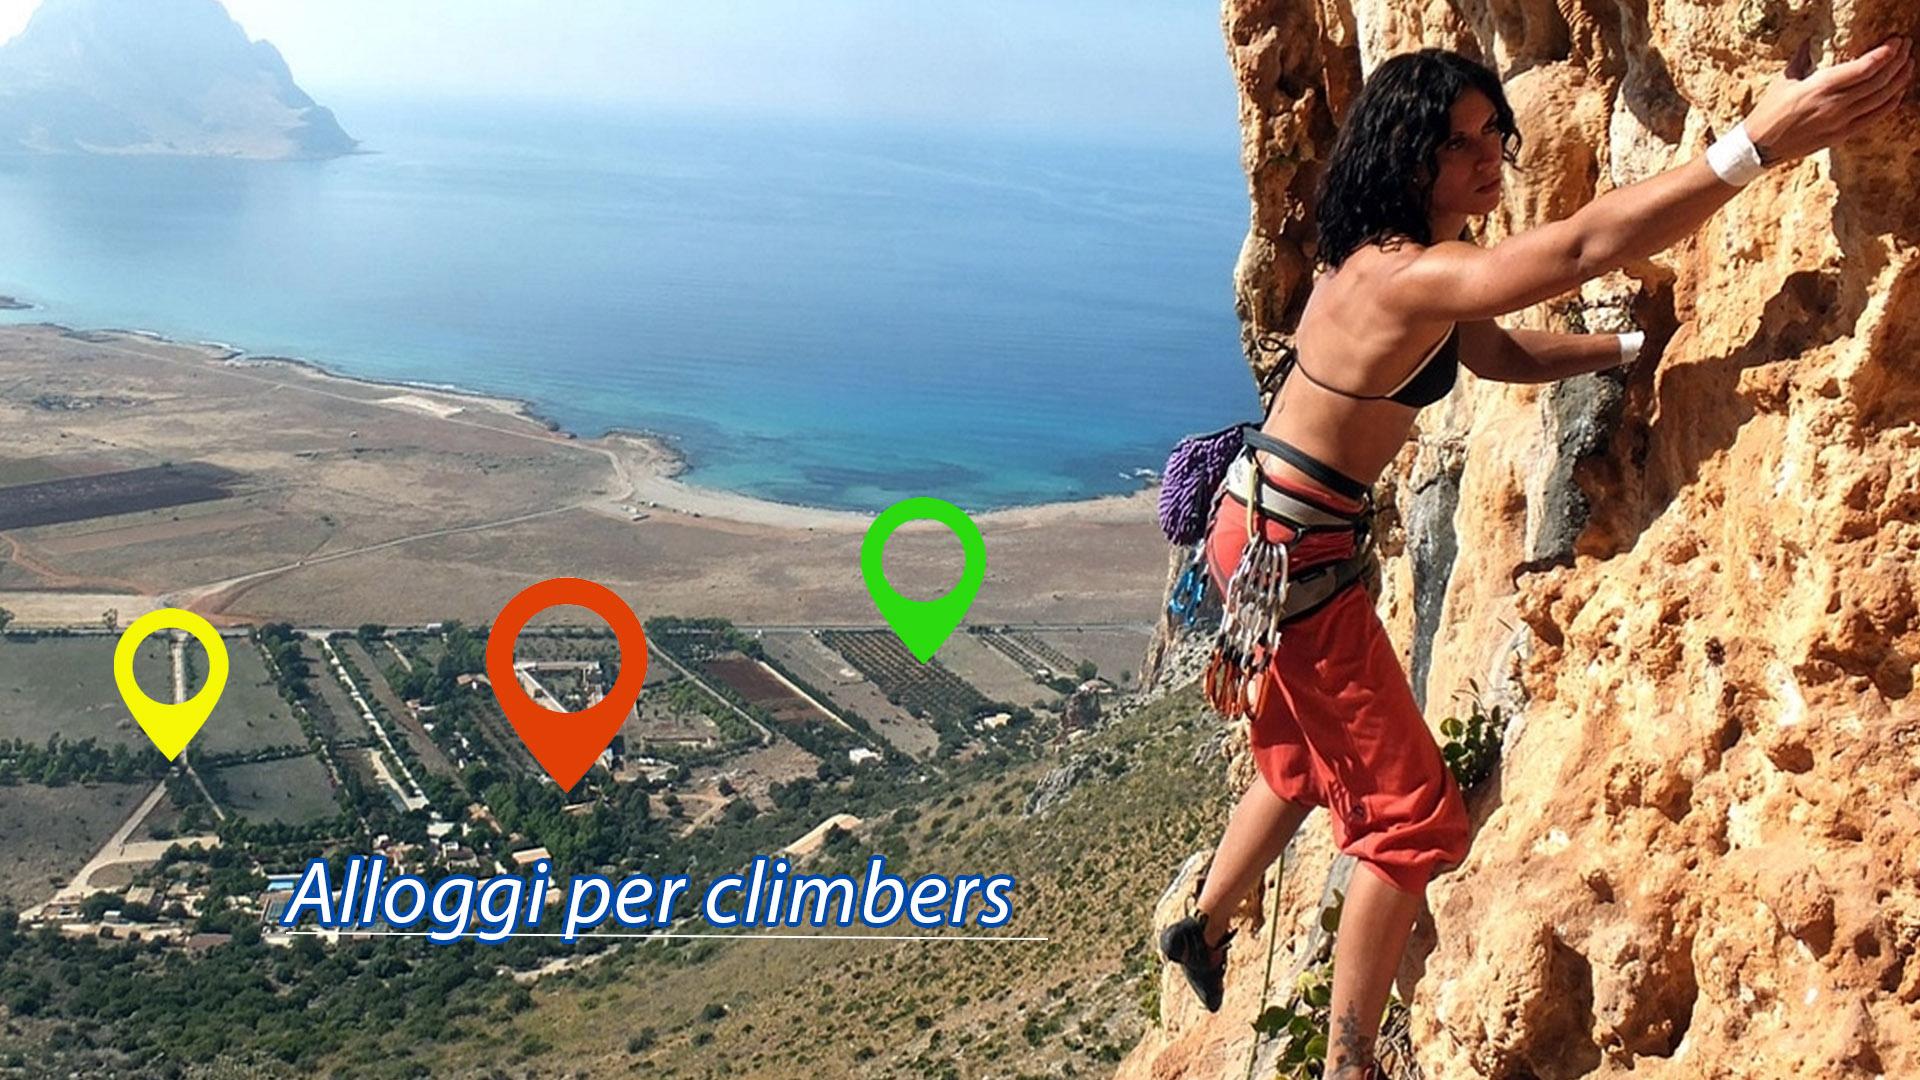 alloggi-climbers-san-vito-lo-capo21463E8B-8AB5-C327-4C6B-C9D1FFC7A40D.jpg